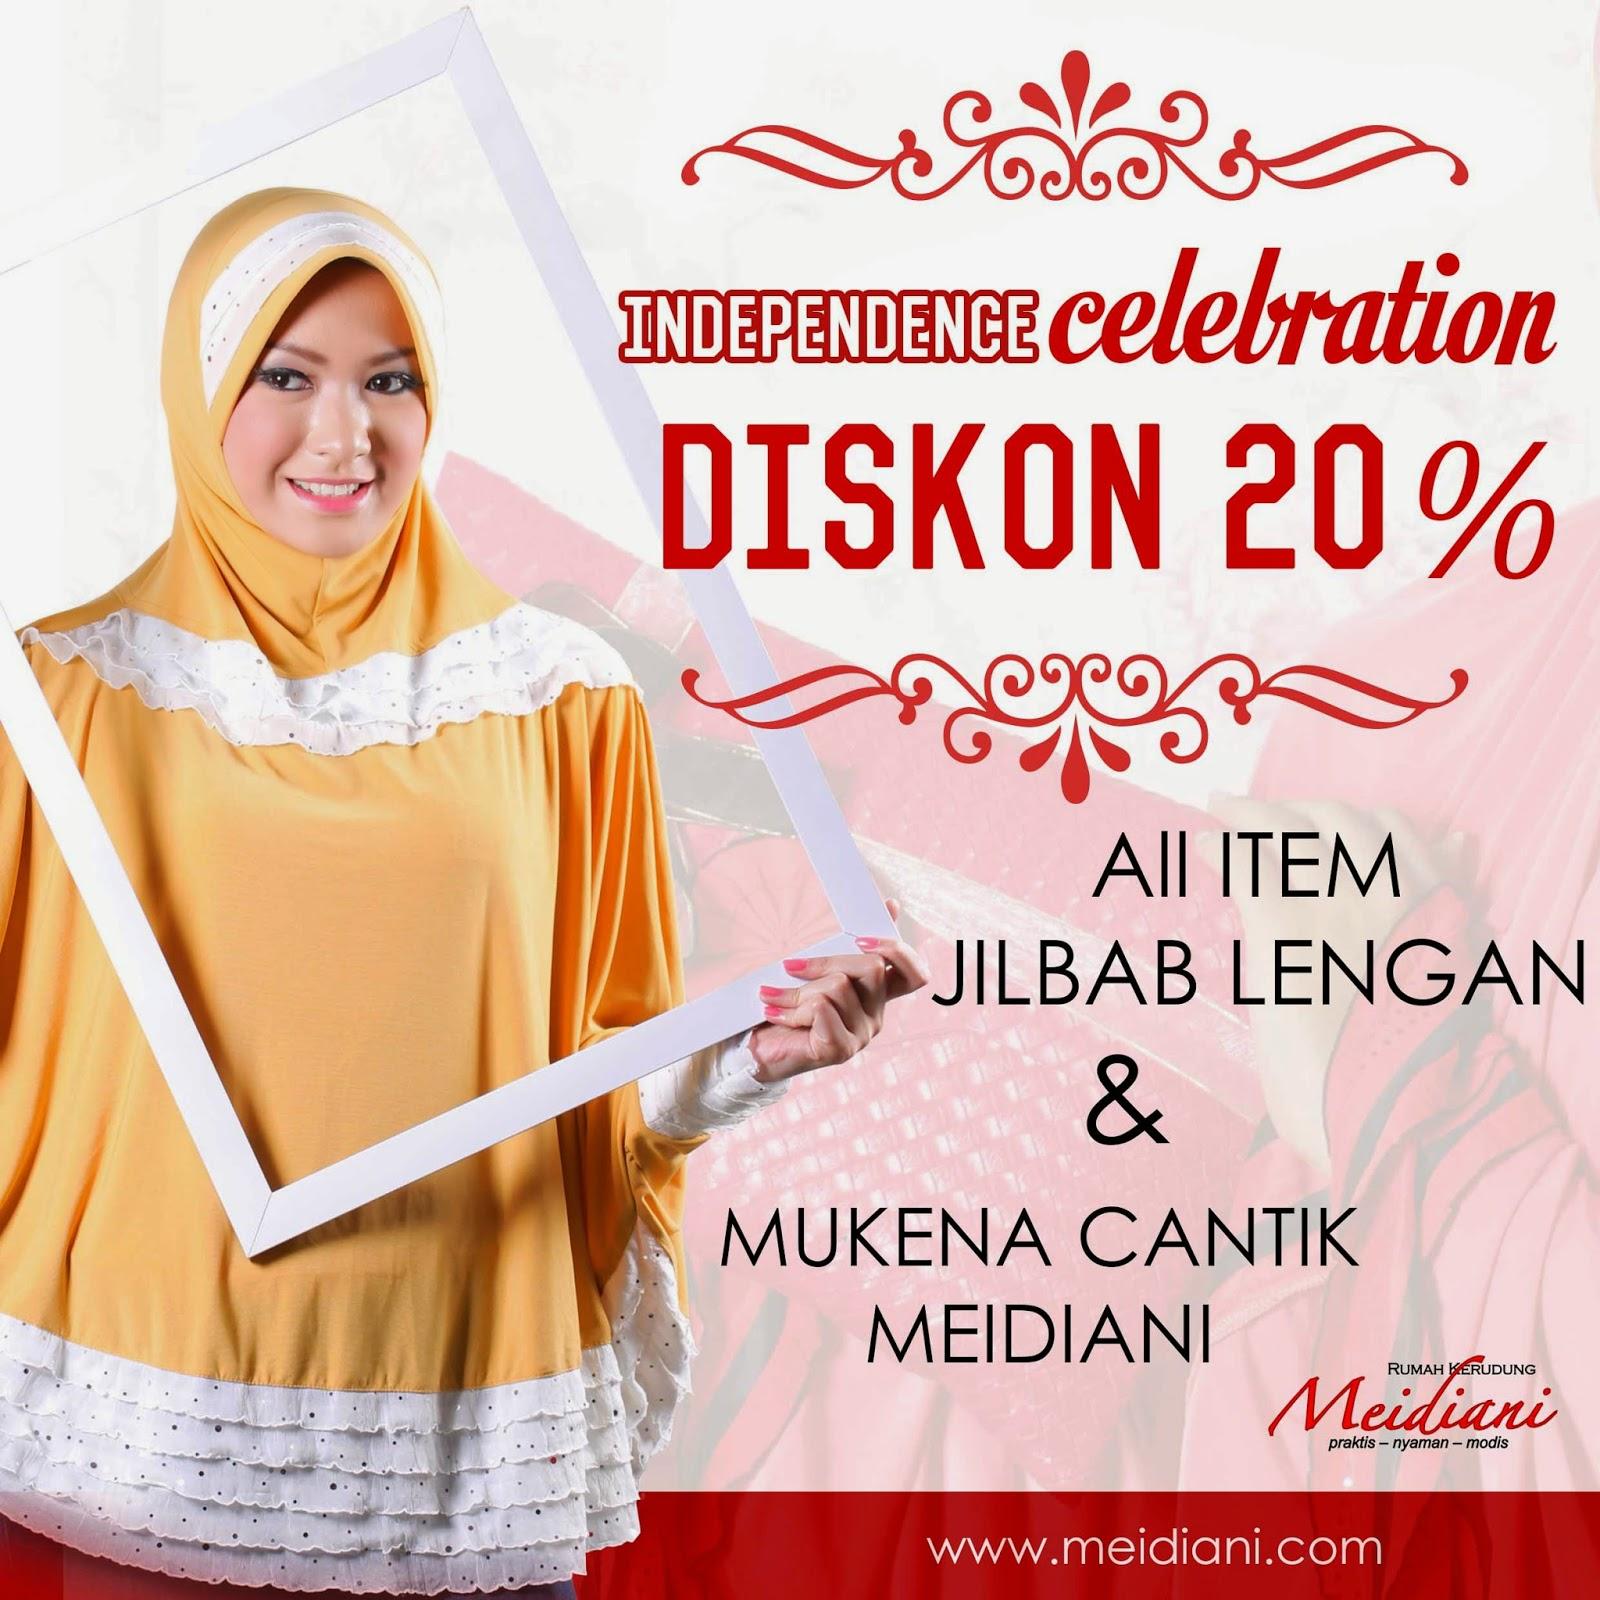 Independence celebration diskon 20%